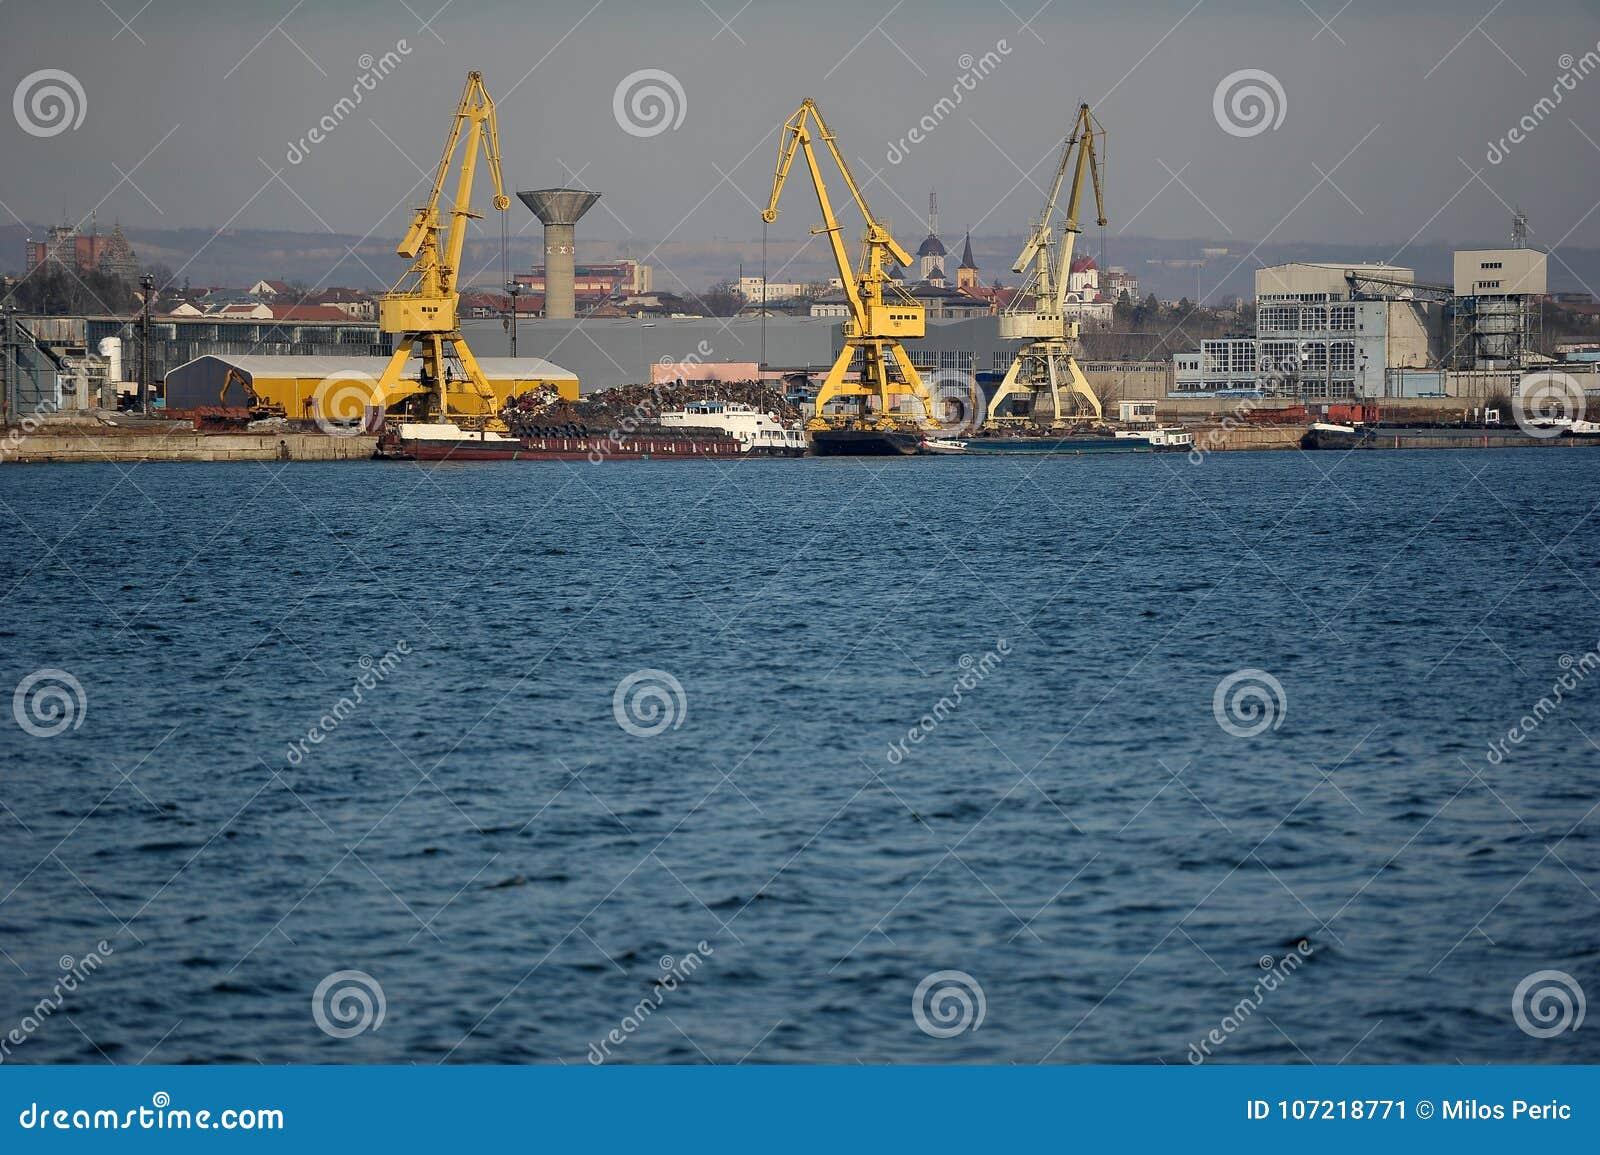 Port crane on sunny day